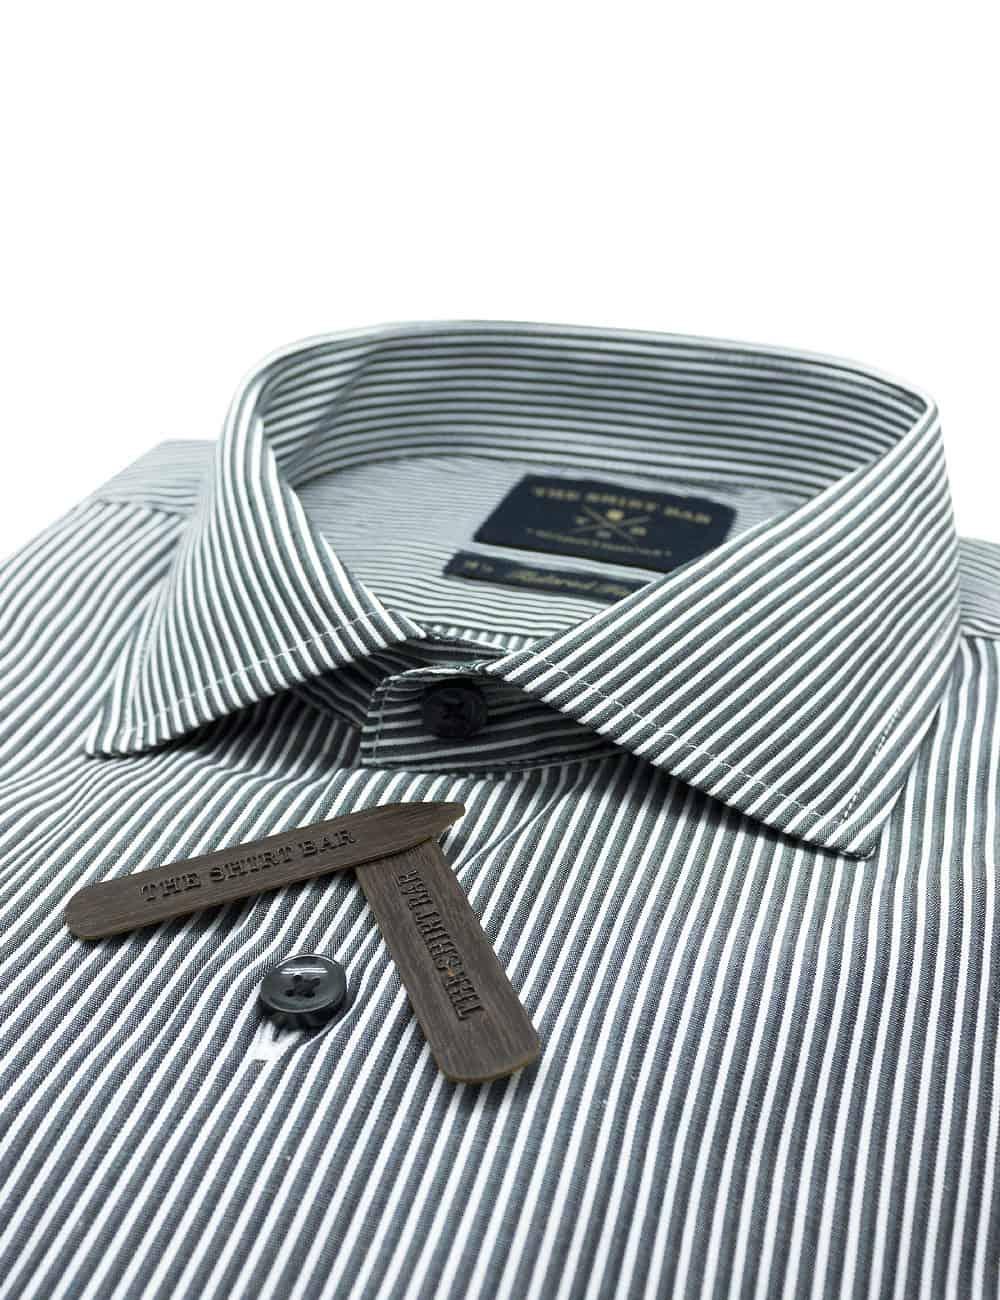 TF Grey and White Stripes 100% Premium Cotton Long Sleeve Single Cuff Shirt TF1C8.5